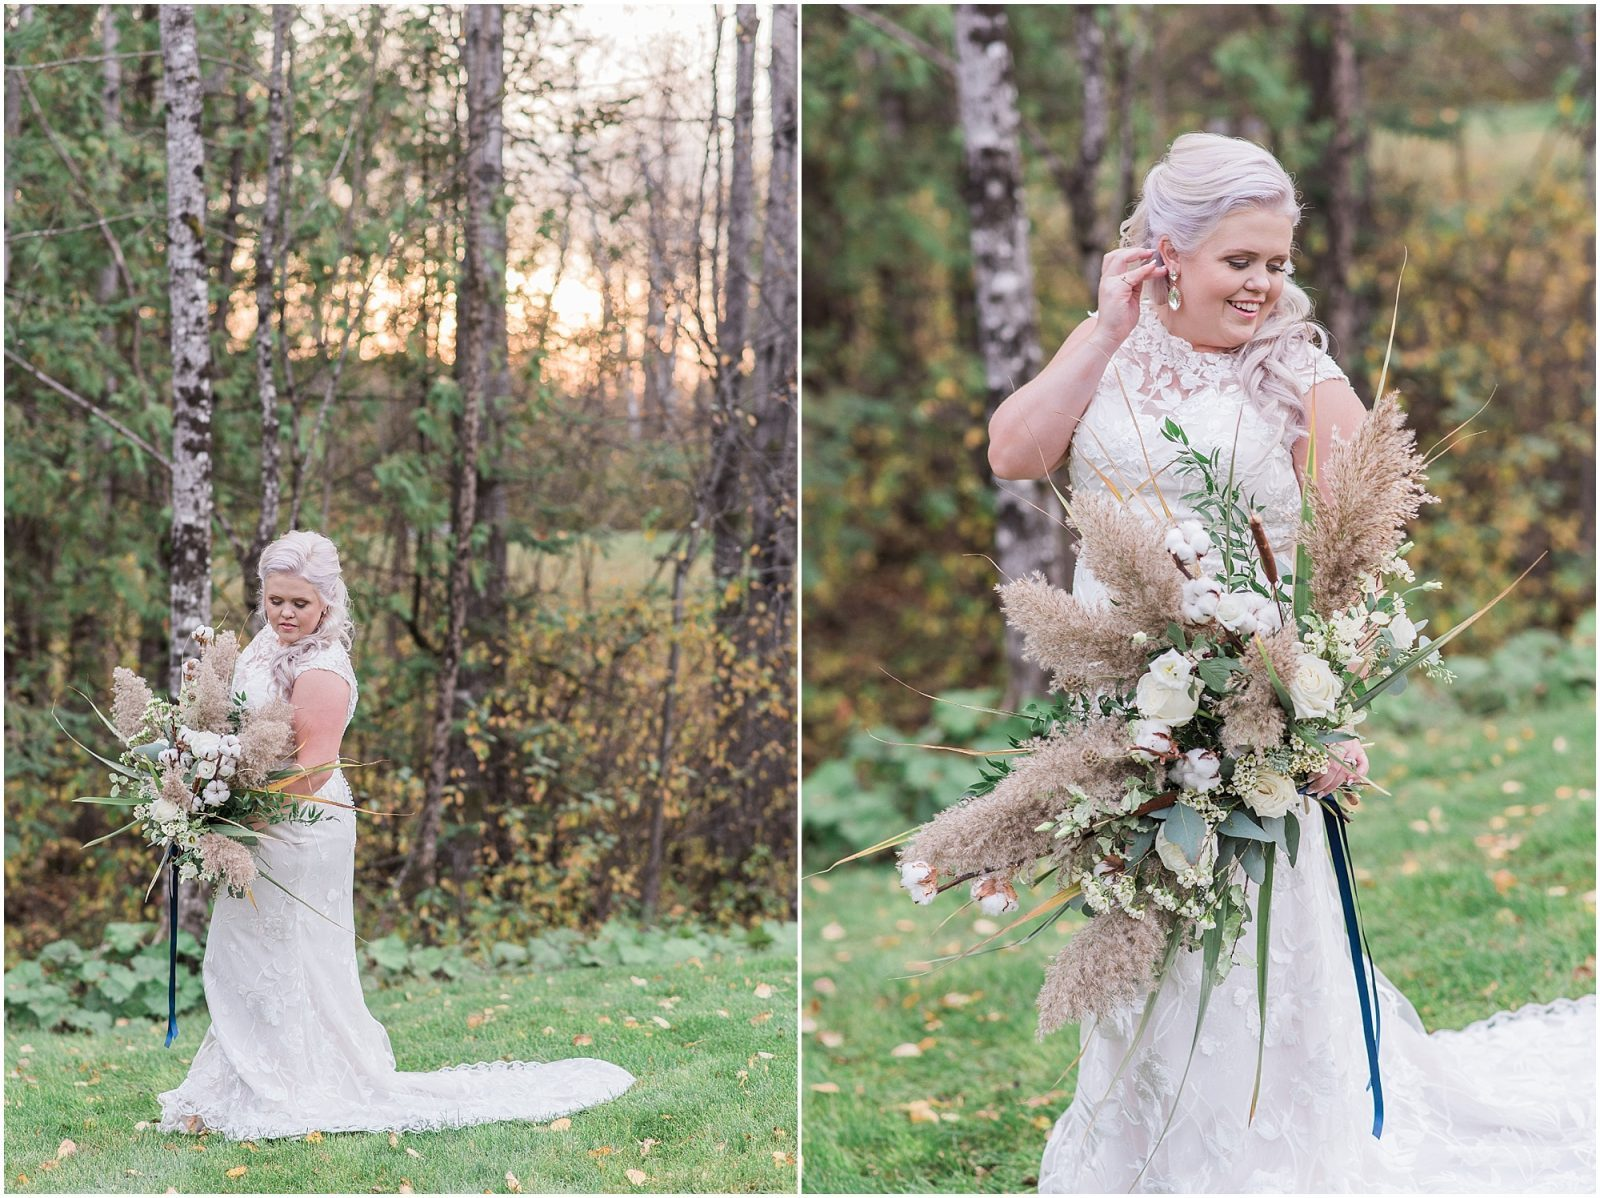 0046 Bethany and Luc - Fall Backyard Ottawa Wedding - Copper and Navy - PhotosbyEmmaH.jpg